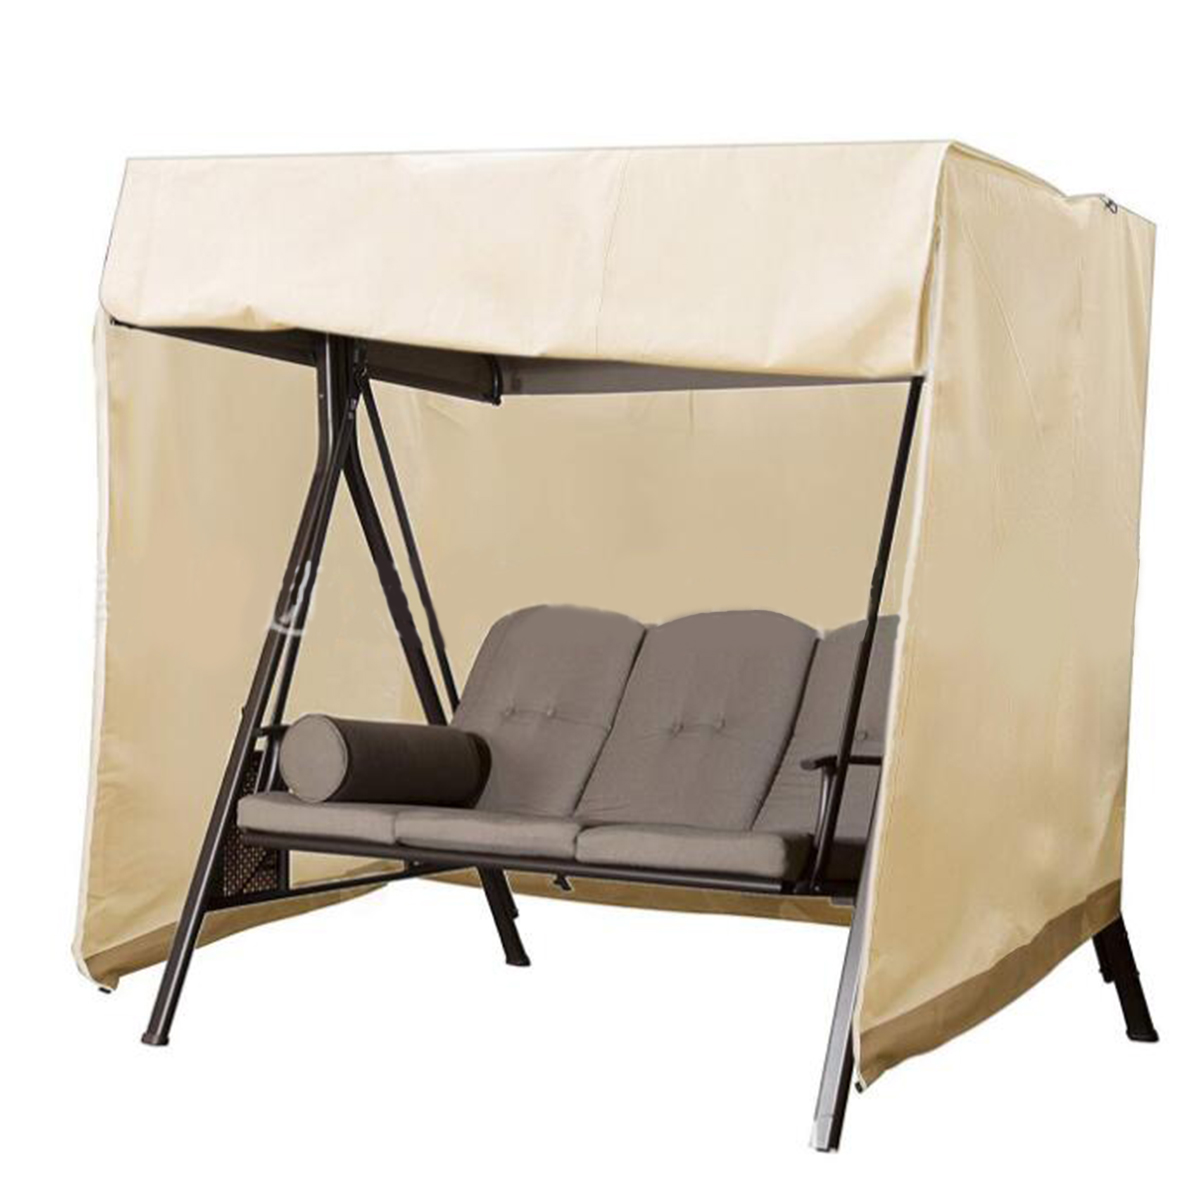 Heavy Duty 3 Seater Swing Waterproof Cover Garden Patio Hammock Chair Outdoor Furniture UV Rain Dust Protector(China)